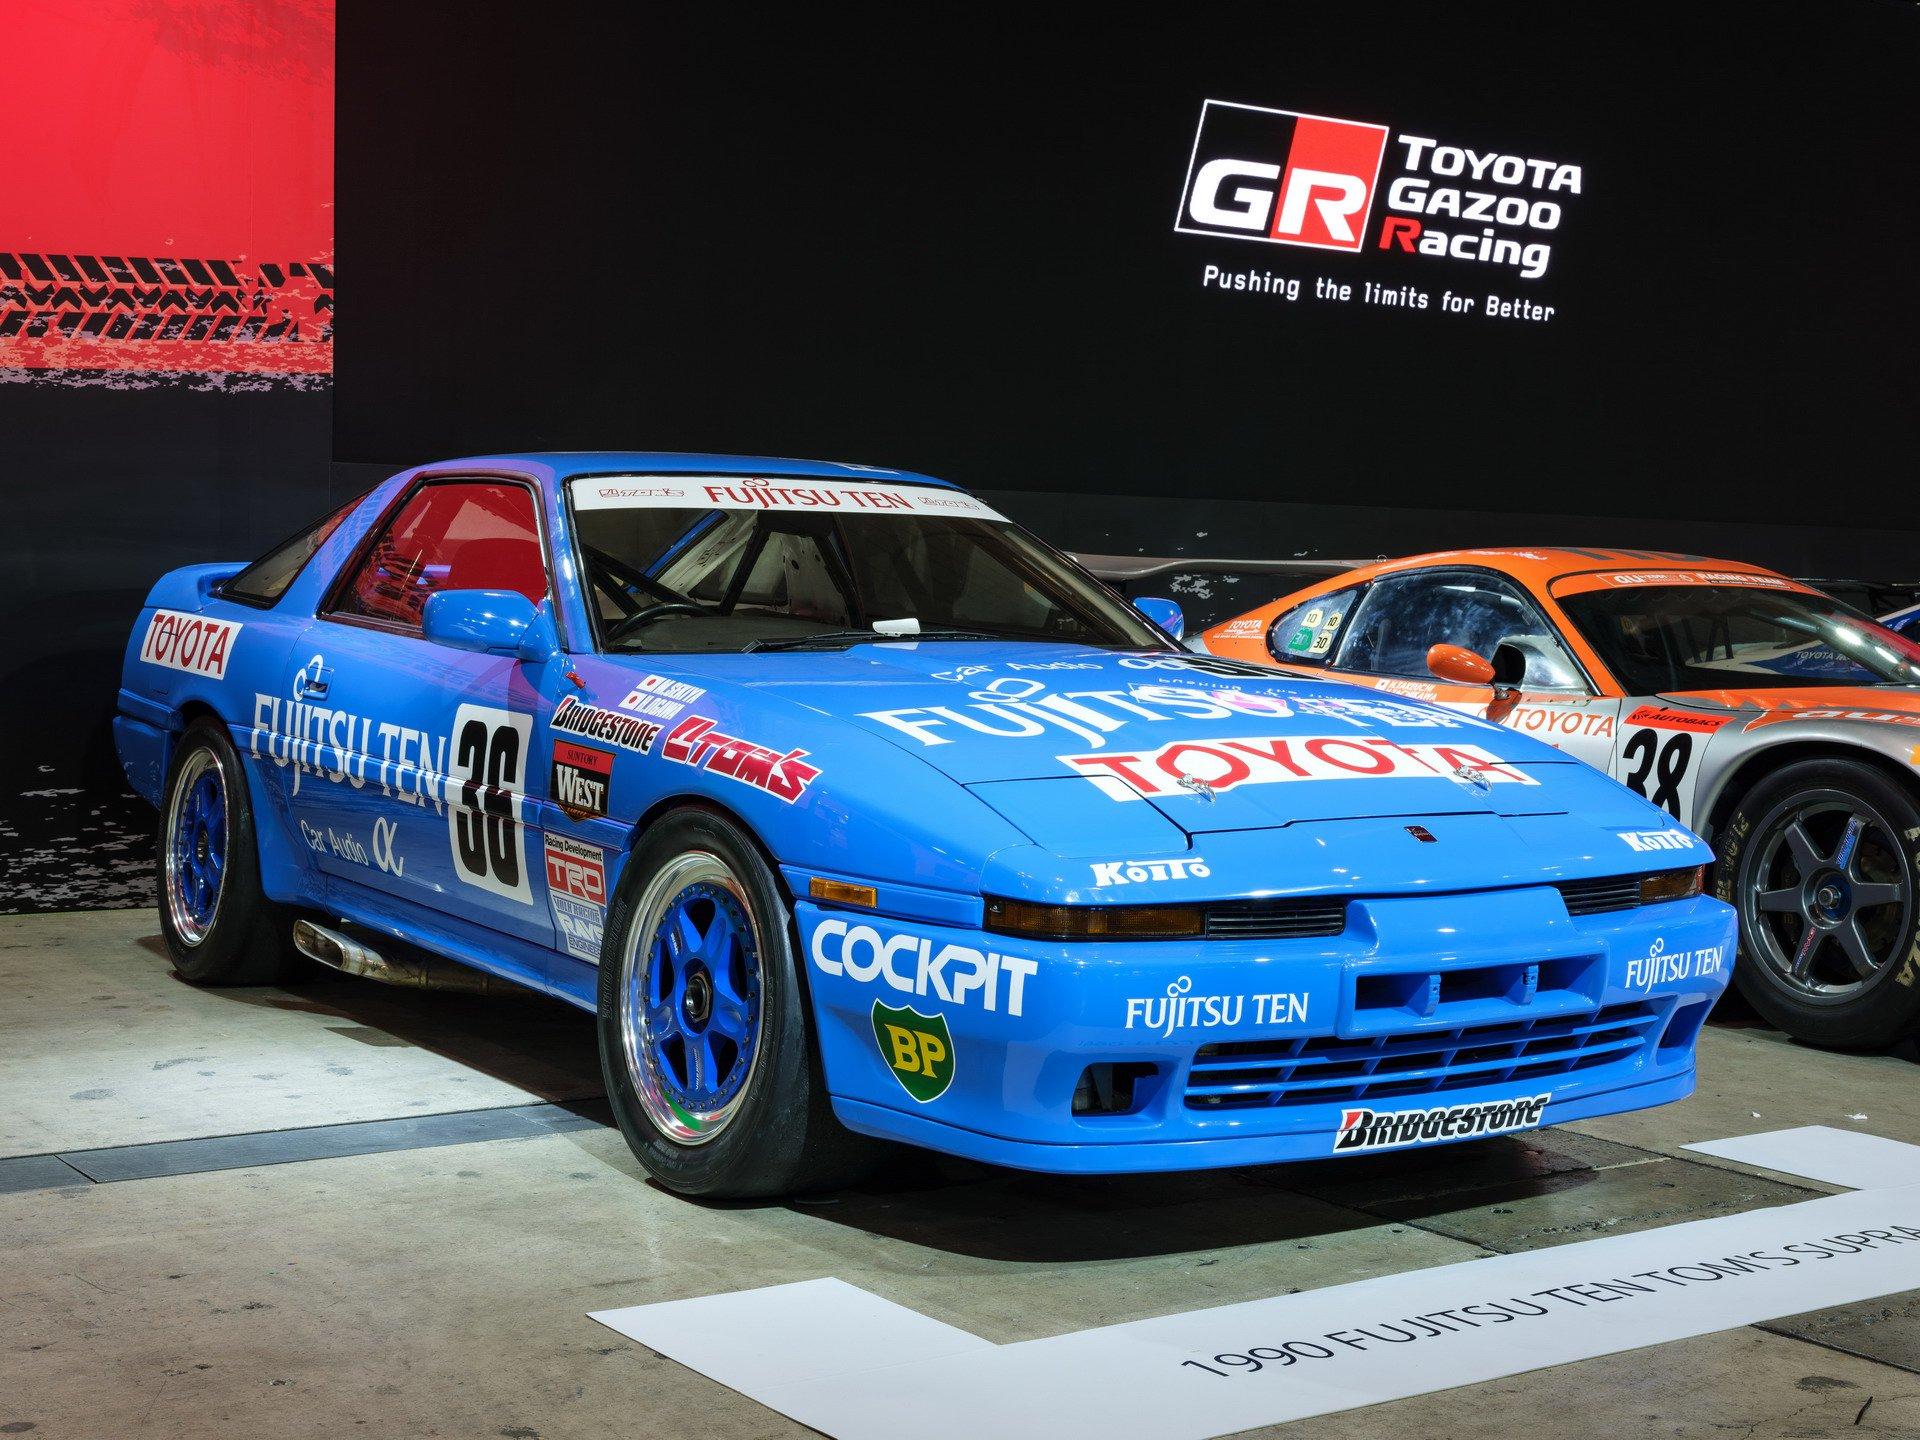 Toyota GR Supra Super GT Concept (15)